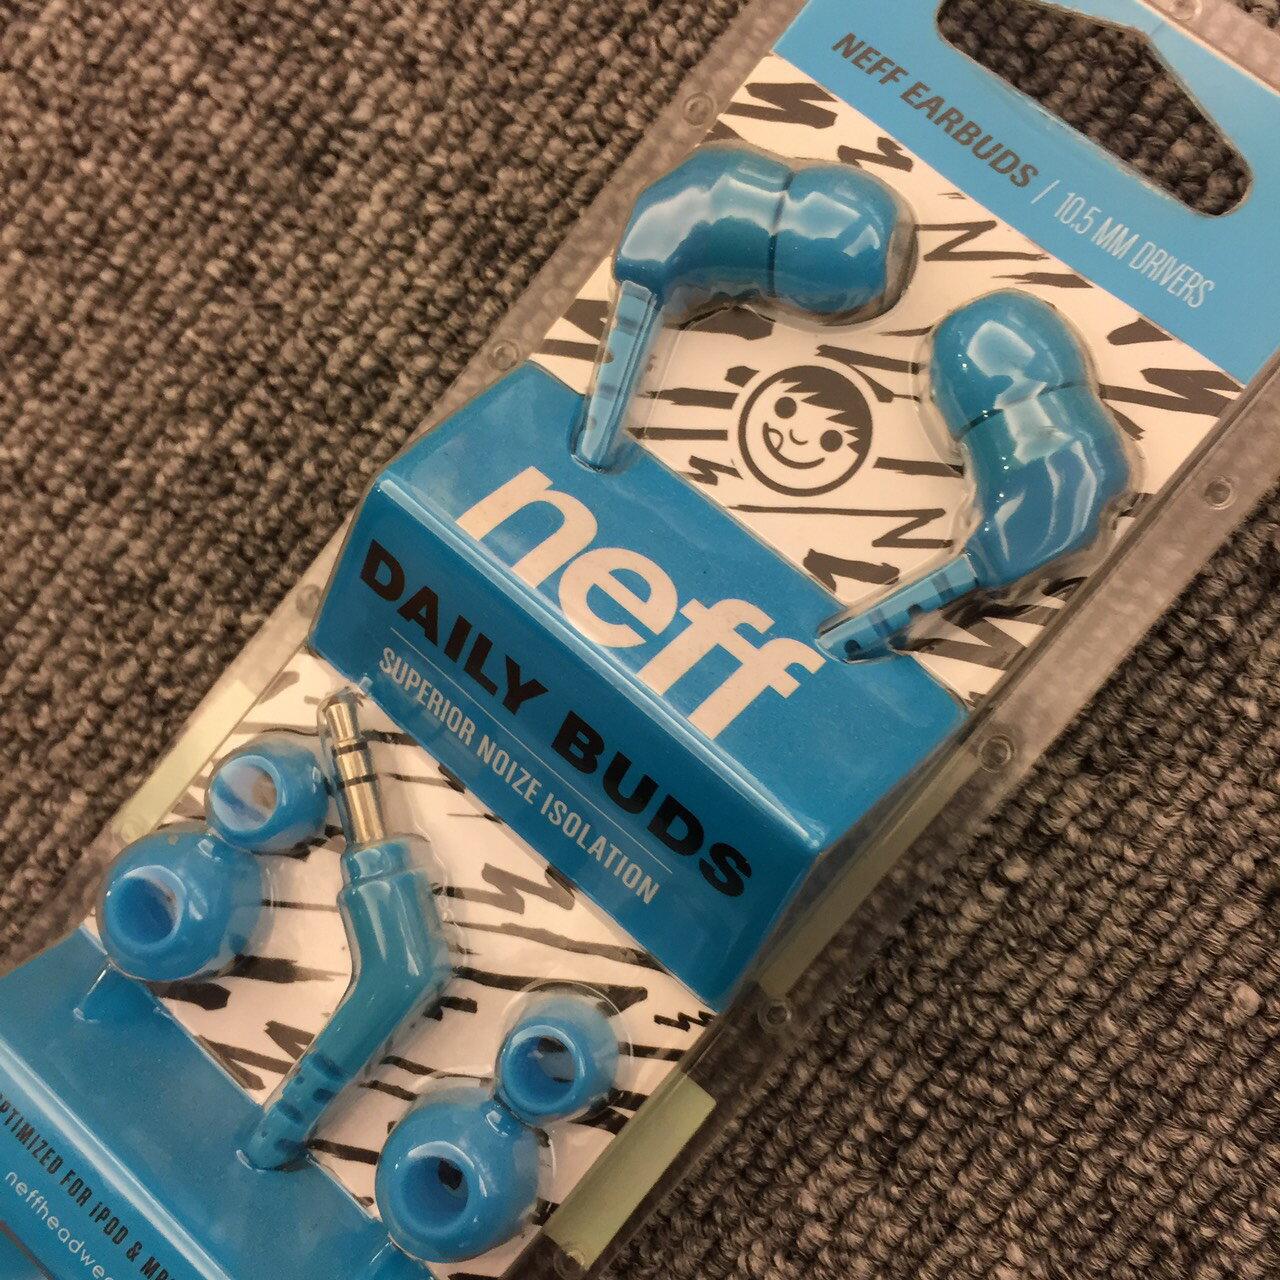 BEETLE PLUS 西門町經銷 全新 美國品牌 NEFF DAILY BUDS EARBUDS BLACK 耳機 耳塞式 藍色 3.5MM IPHONE EB-05 1